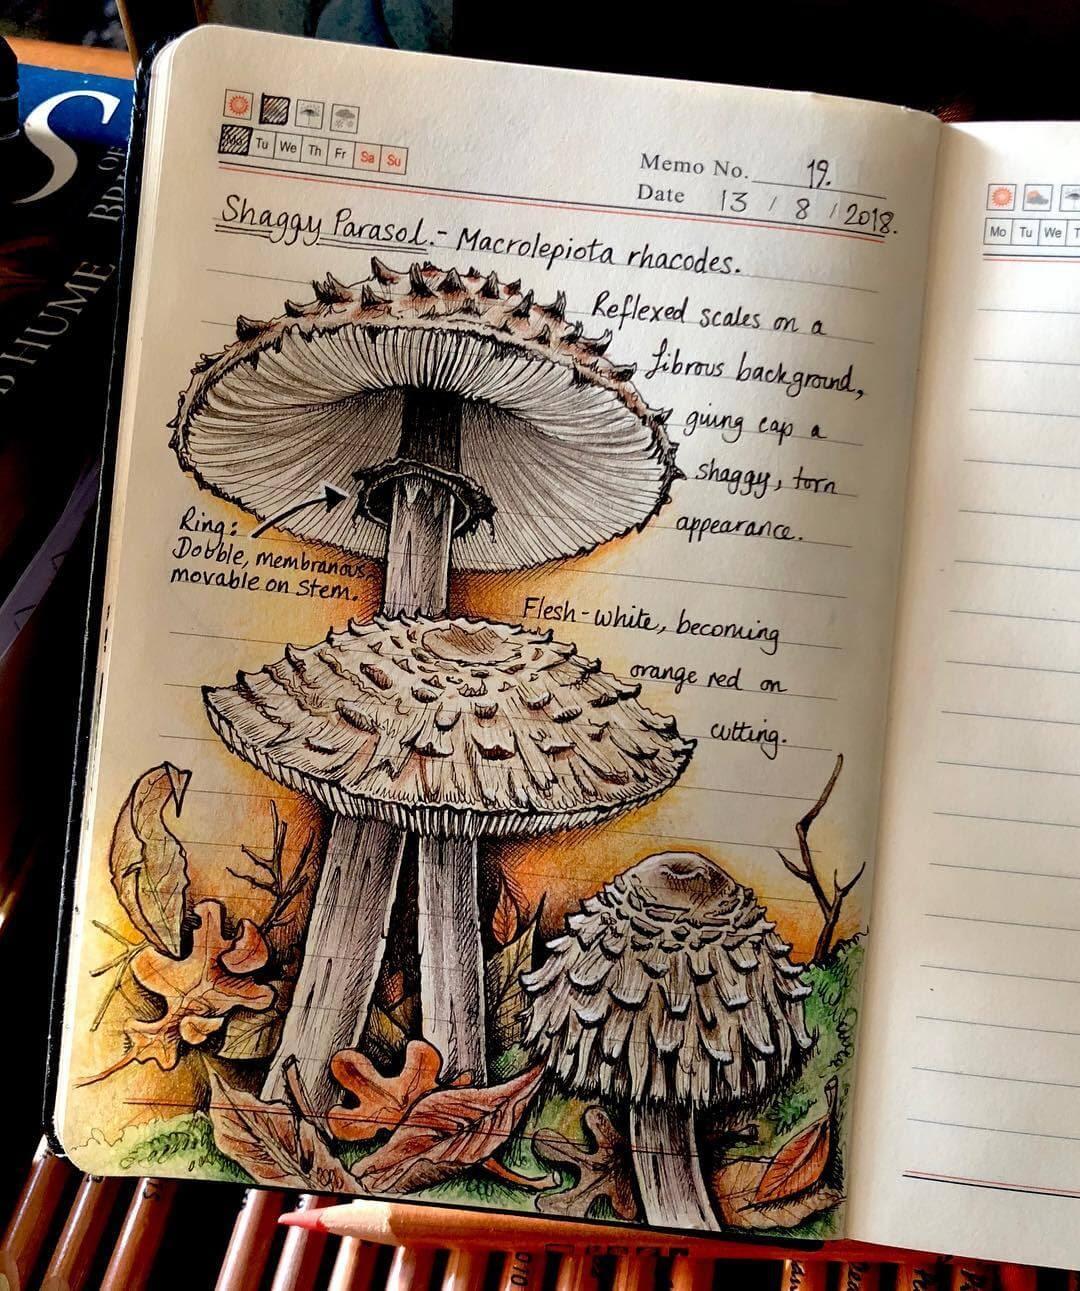 05-Mushroom-Shaggy-Parasol-Macrolepiota-rhacodes-J-Brown-www-designstack-co